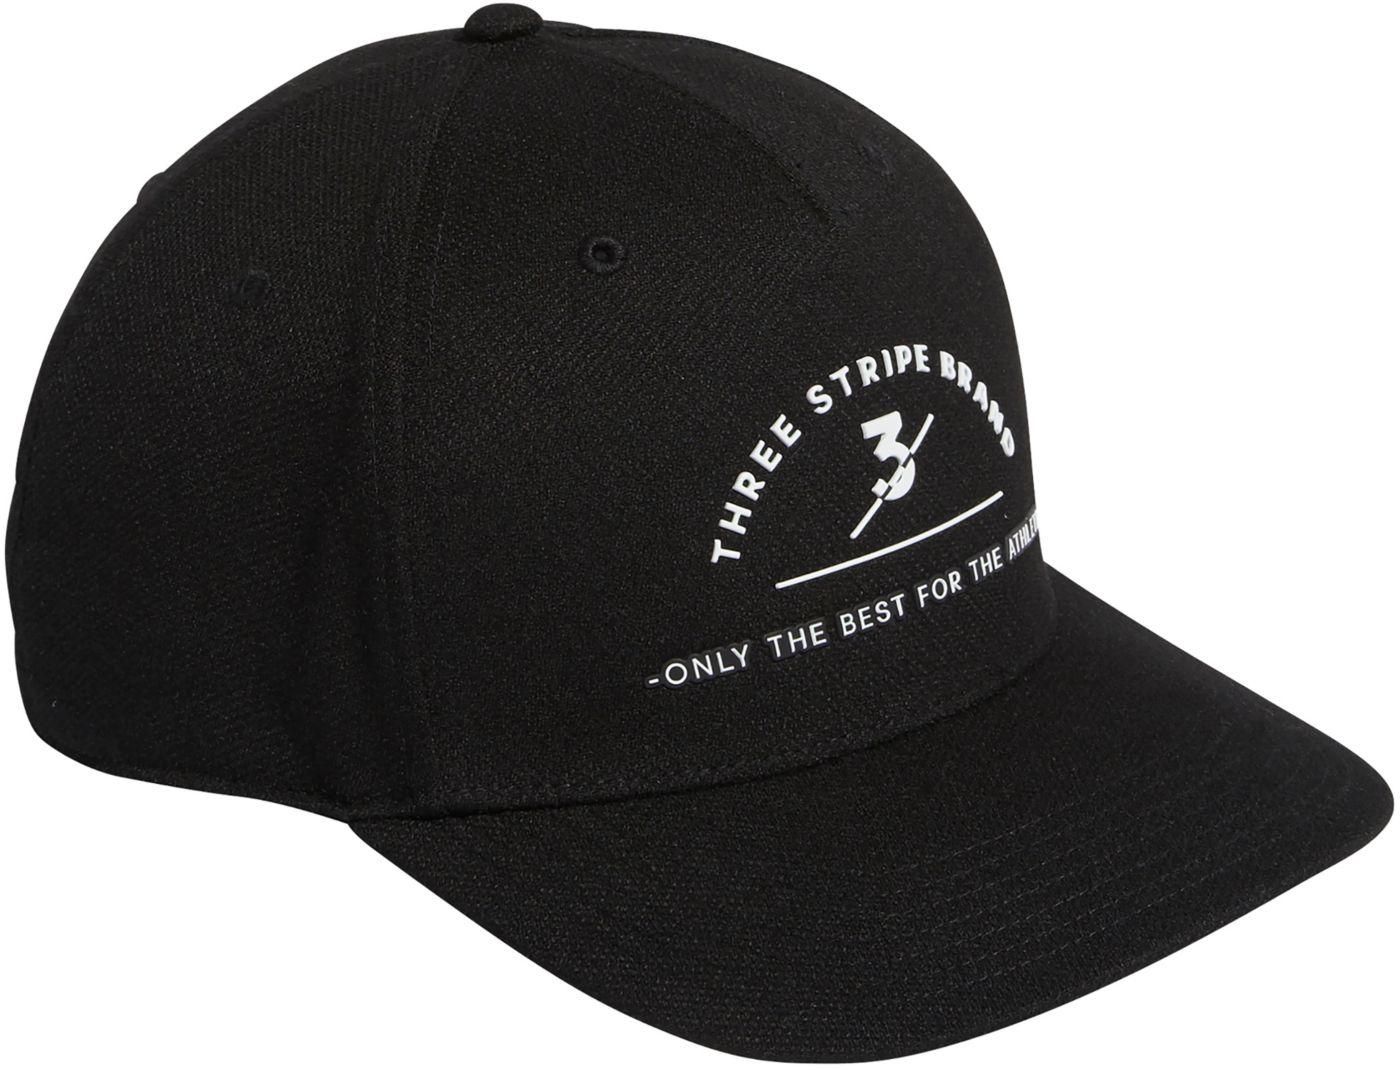 adidas Men's Three Stripes Brand Golf Hat